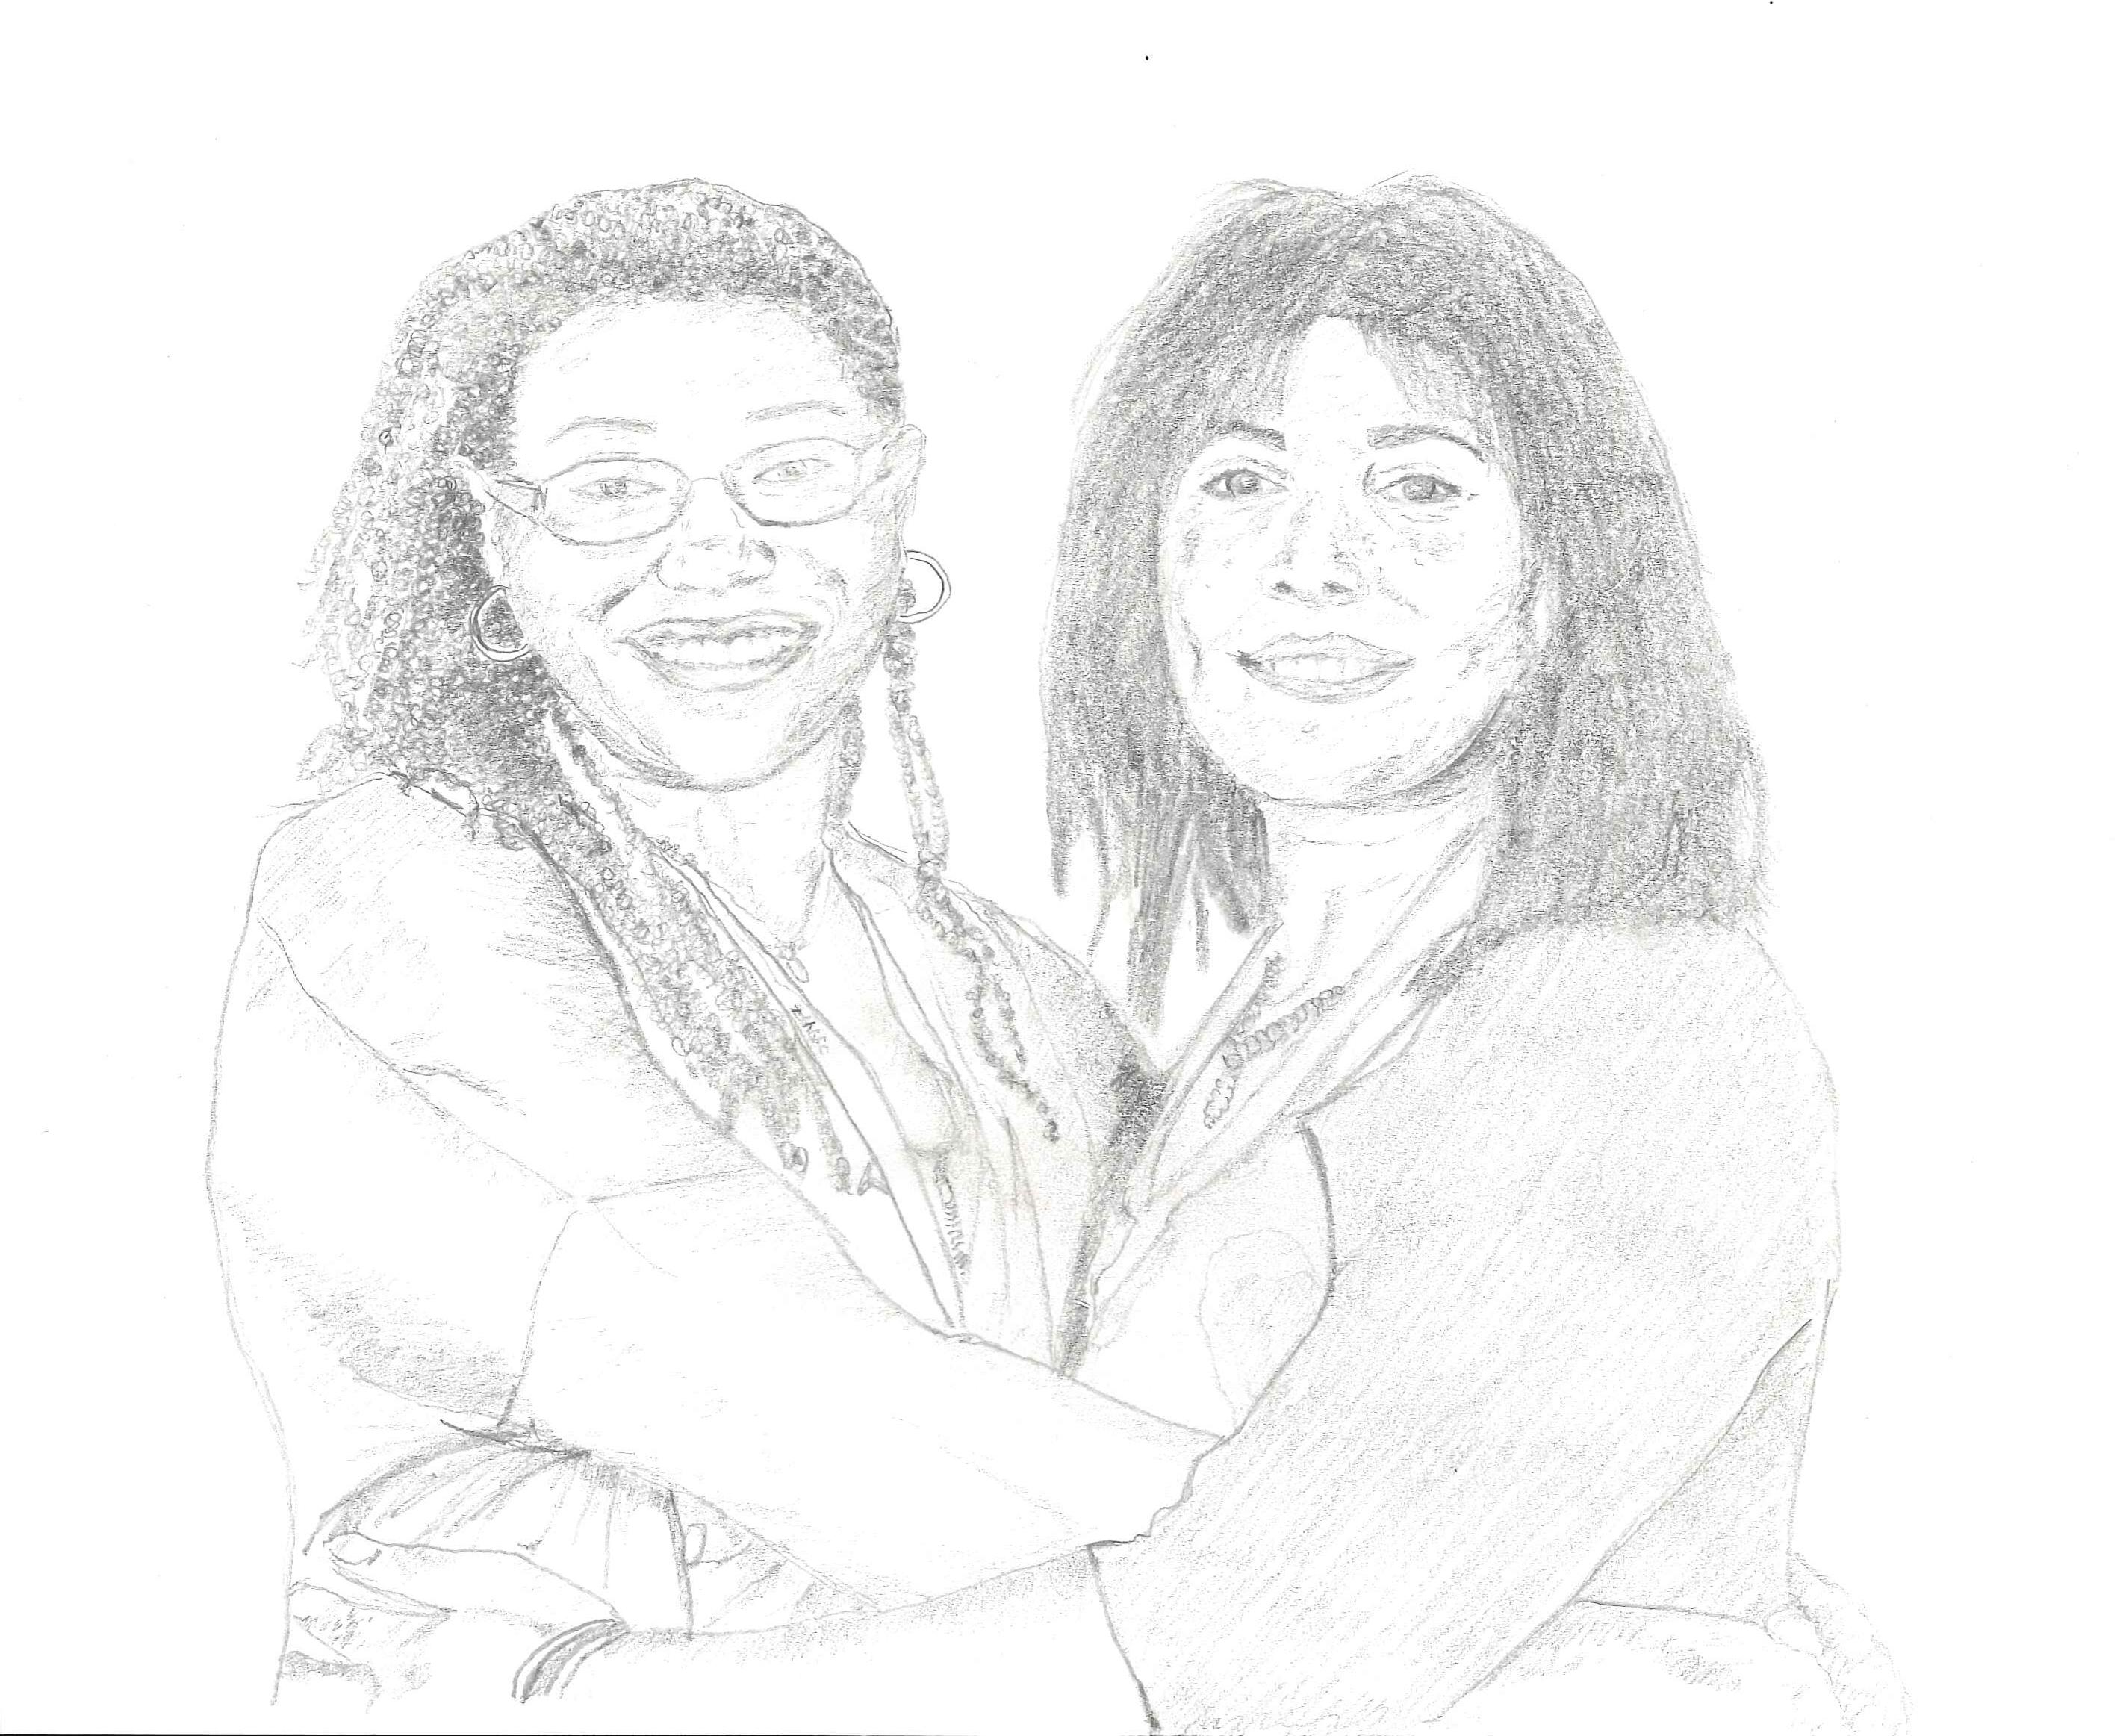 Friends Treasured_Marcella Kirby